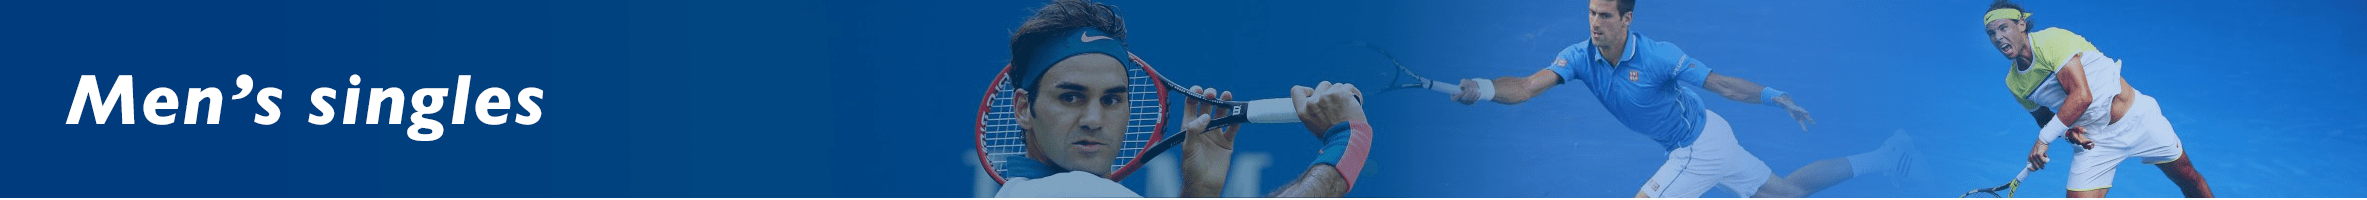 Australian Open men's singles